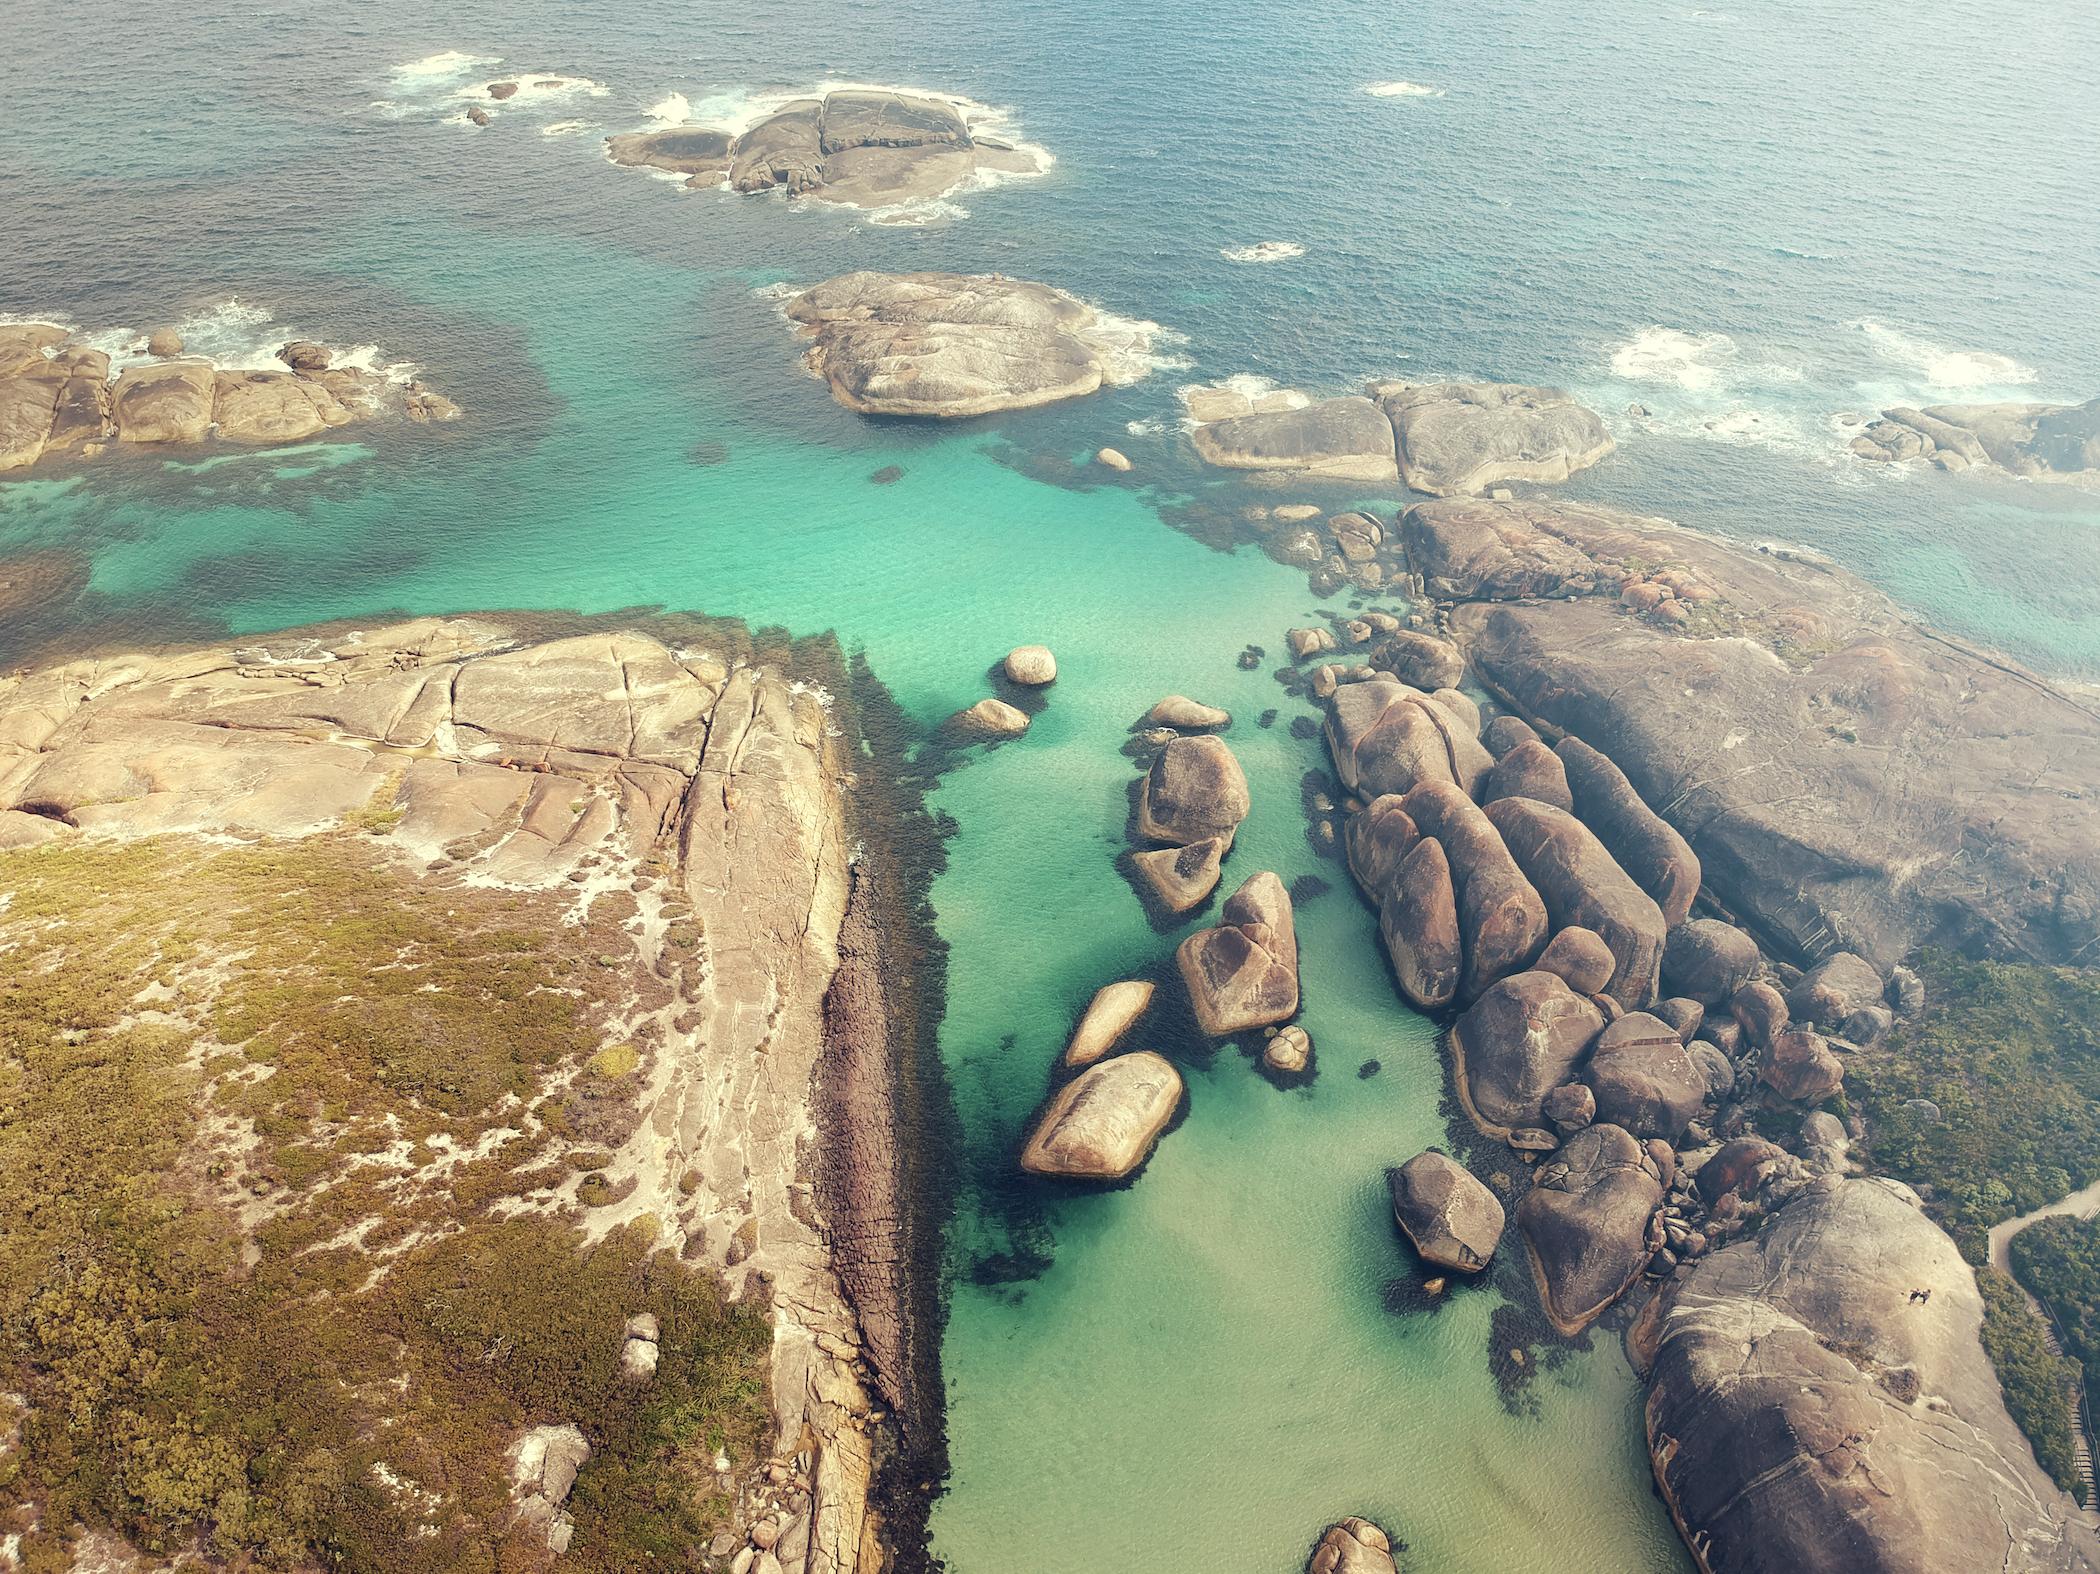 maybeyoulike_elephant_rocks_australia_6